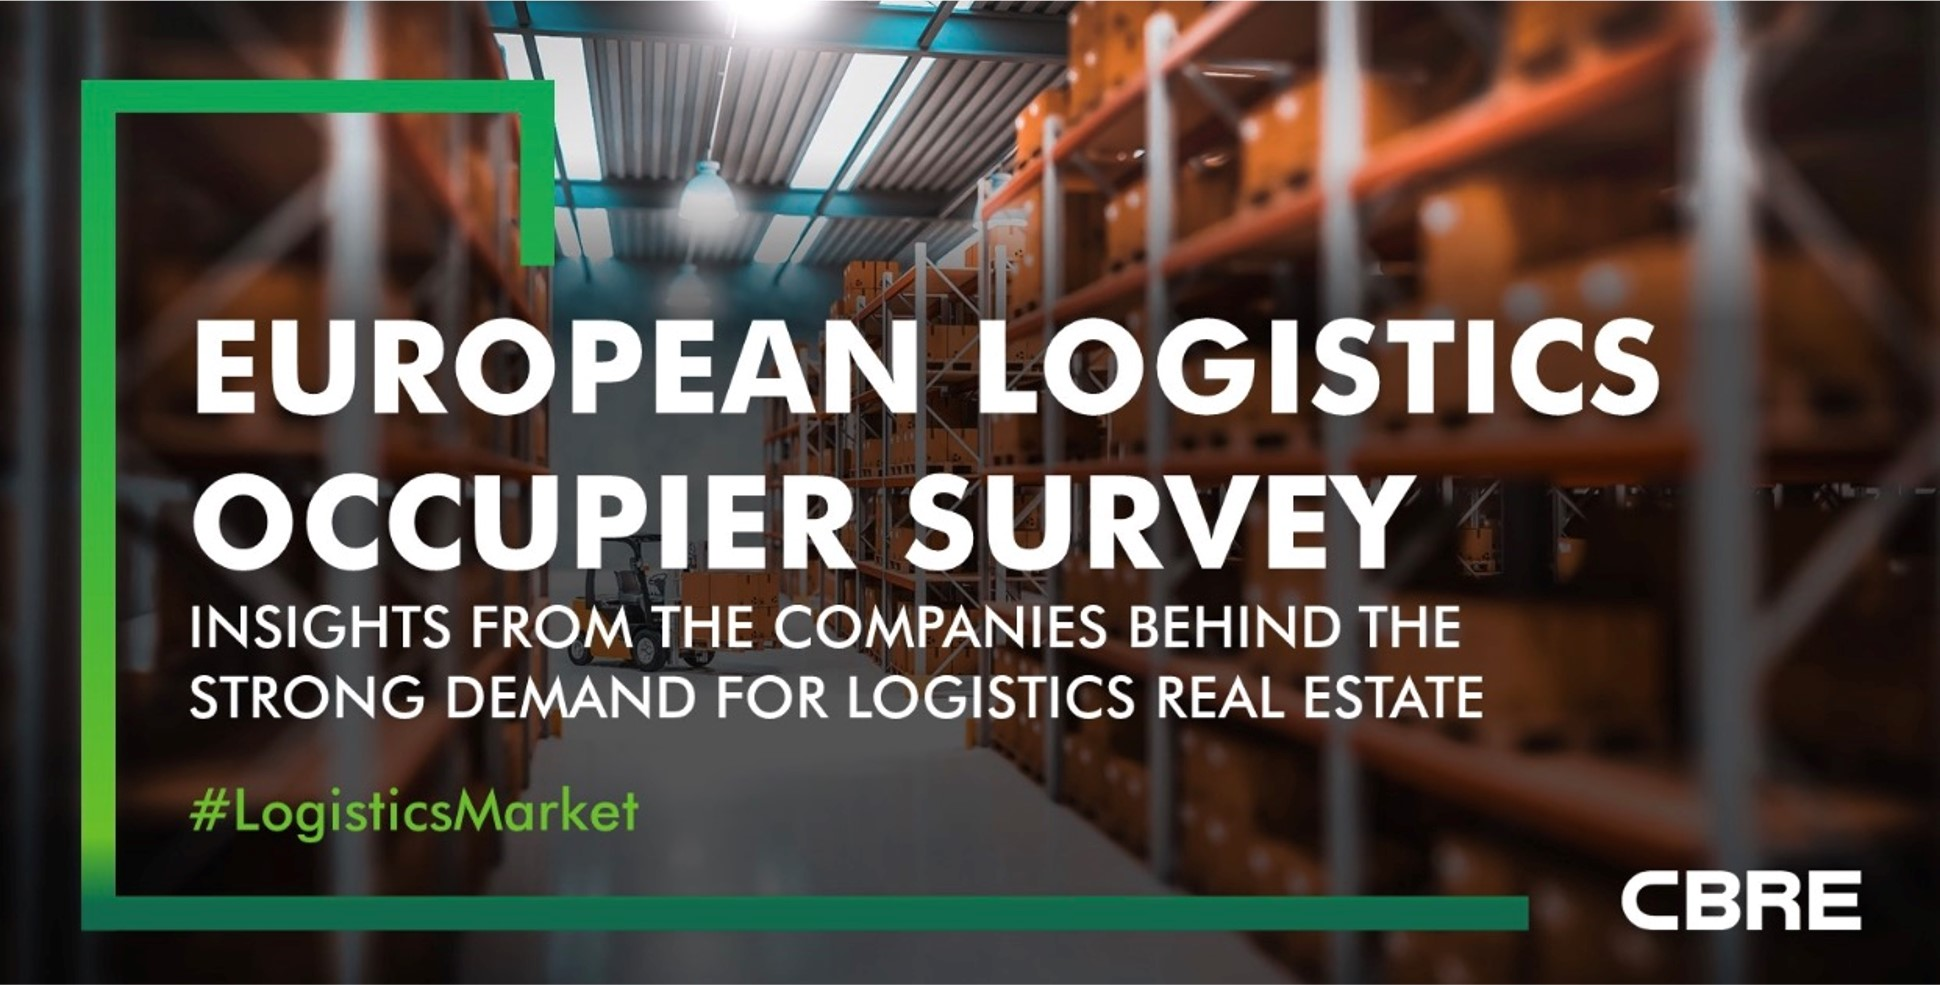 CBRE-logistics-occupier-survey-real-estate